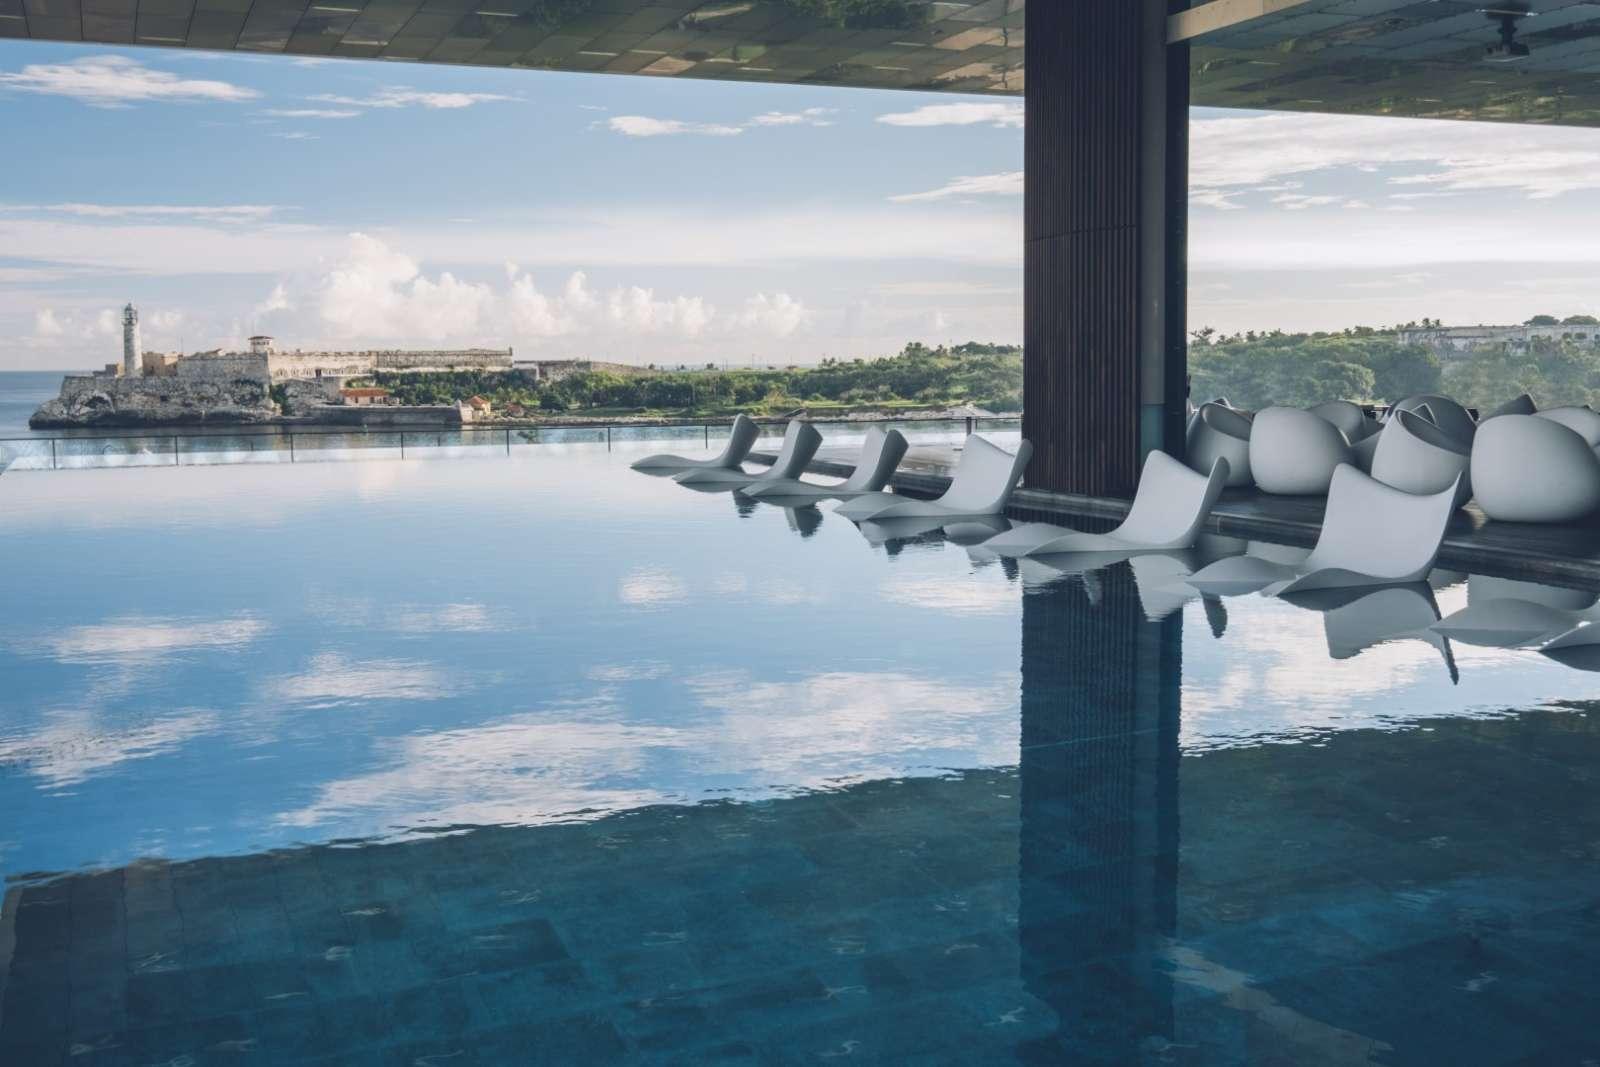 Pool seats at the Iberostar Packard hotel in Havana, Cuba